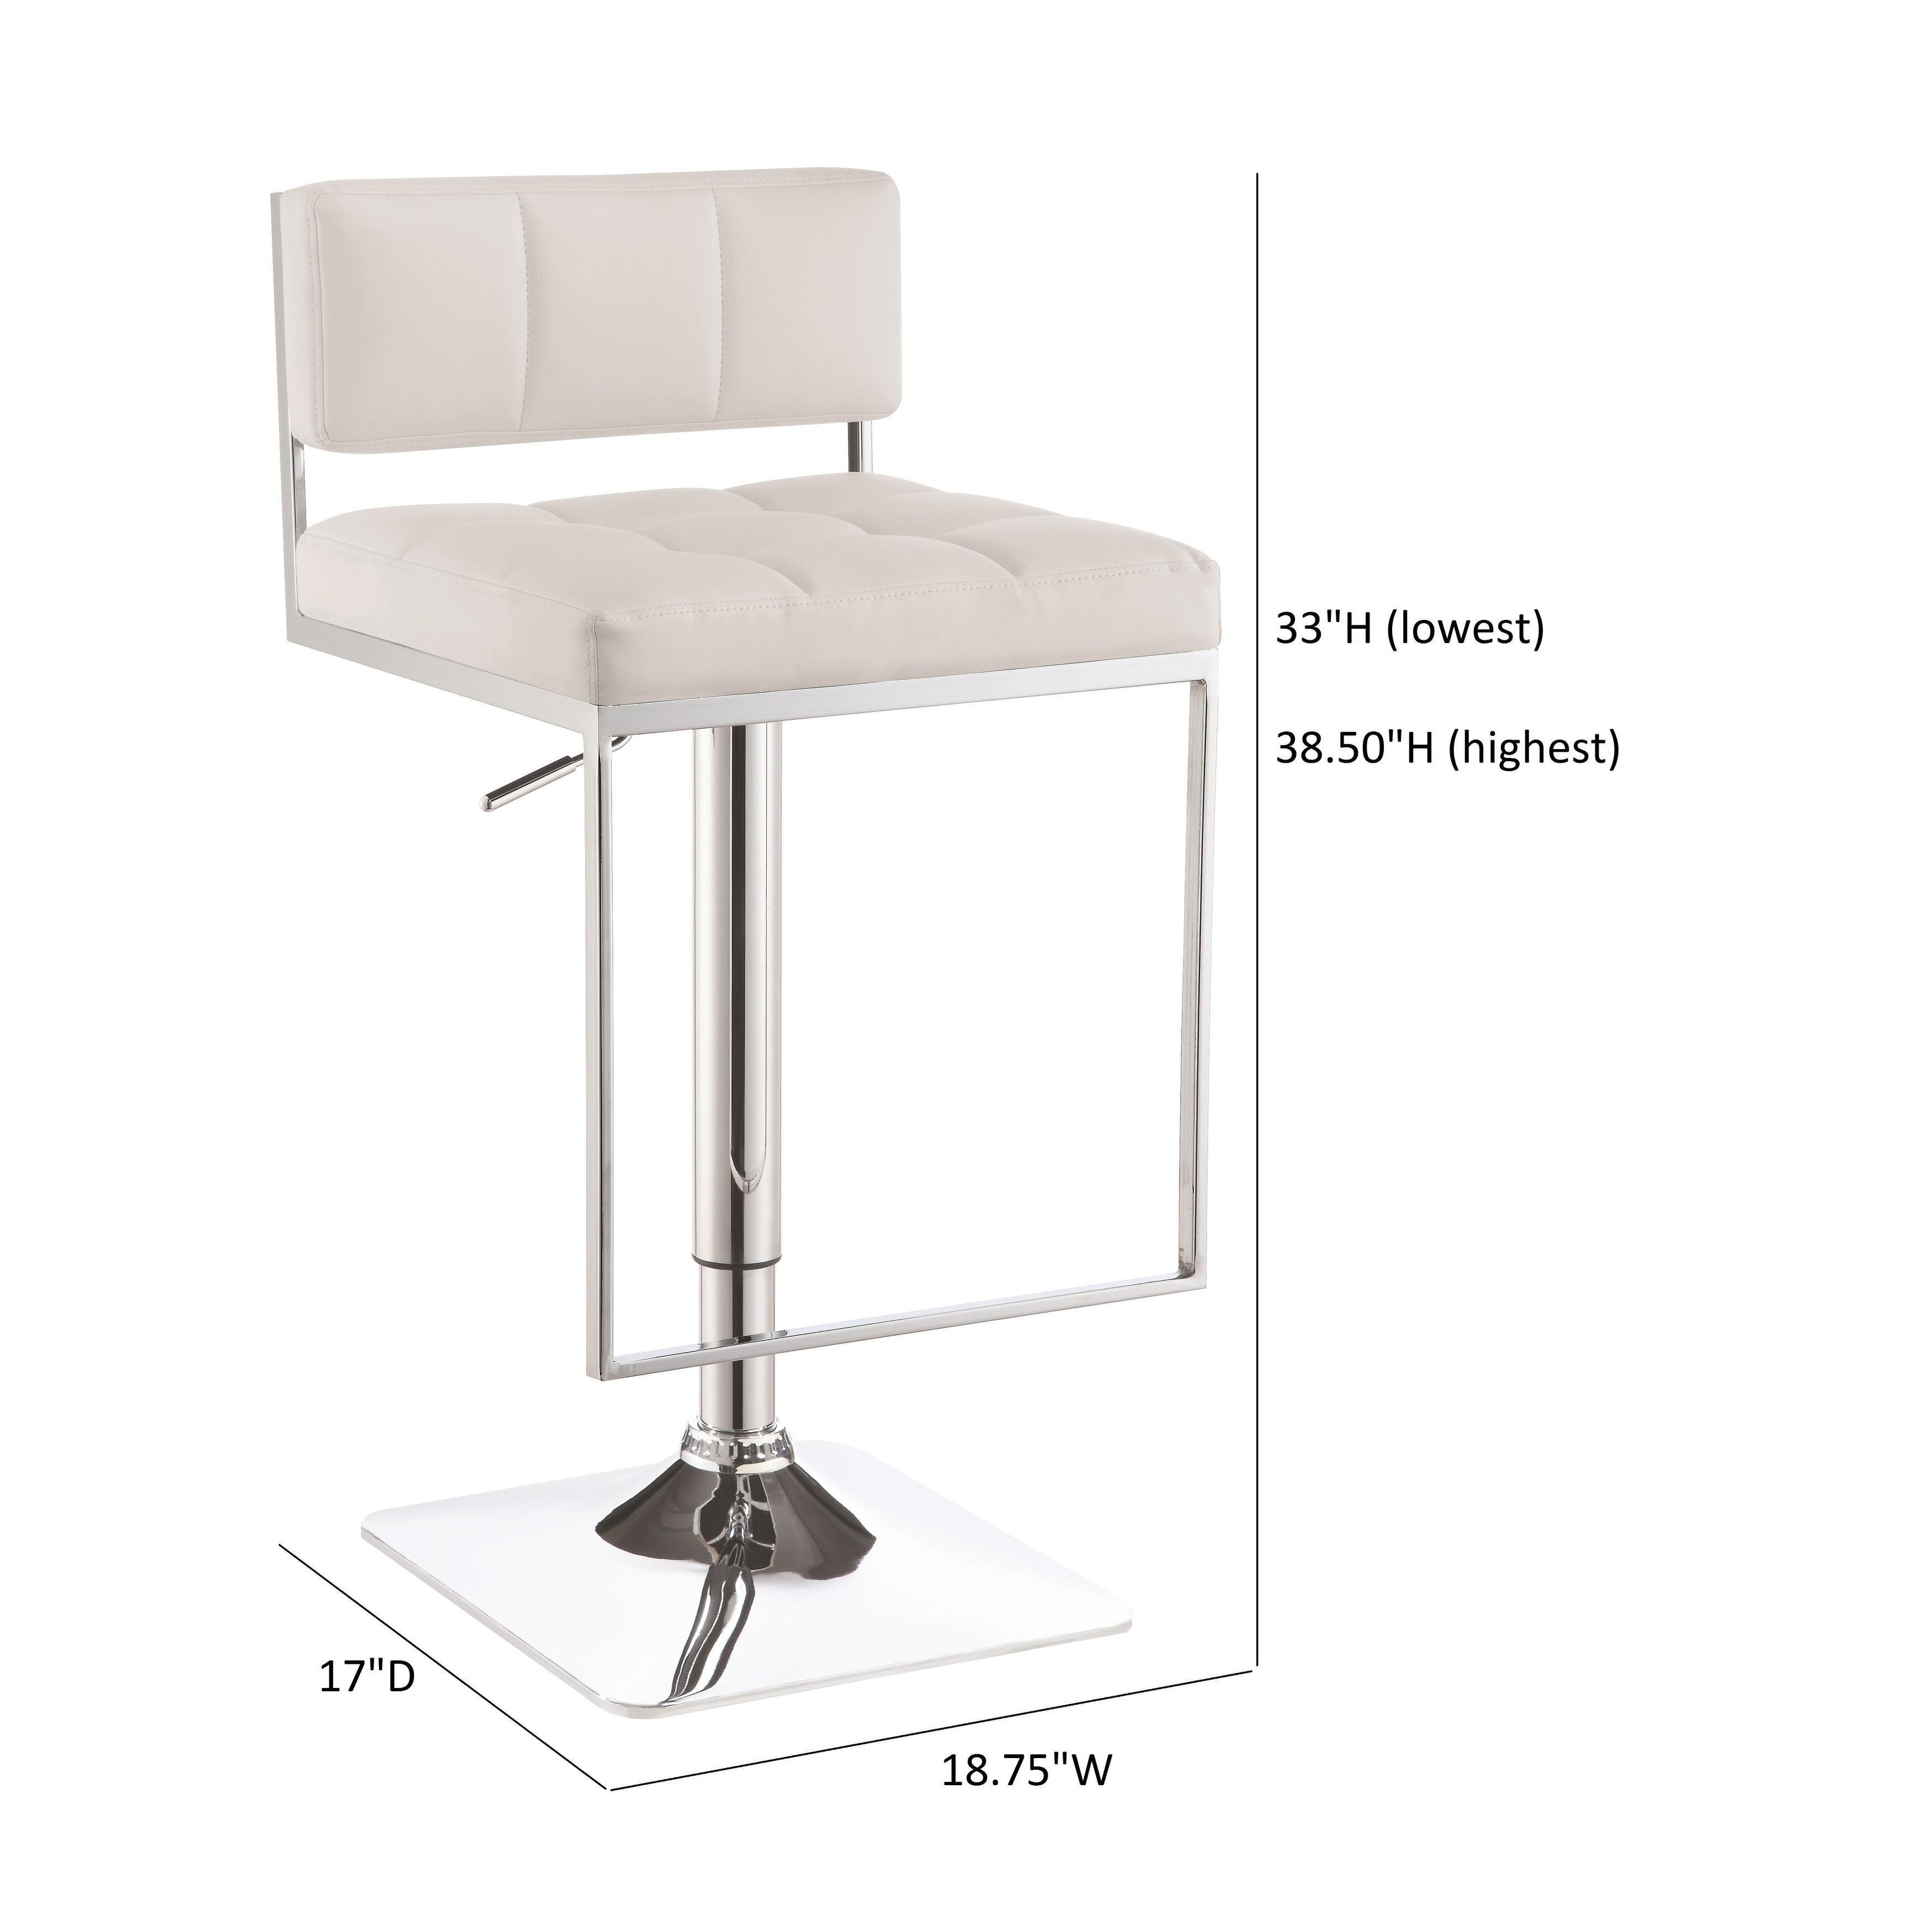 Peachy Silver Orchid Price Silver Metal Foam Adjustable Bar Stool Ibusinesslaw Wood Chair Design Ideas Ibusinesslaworg